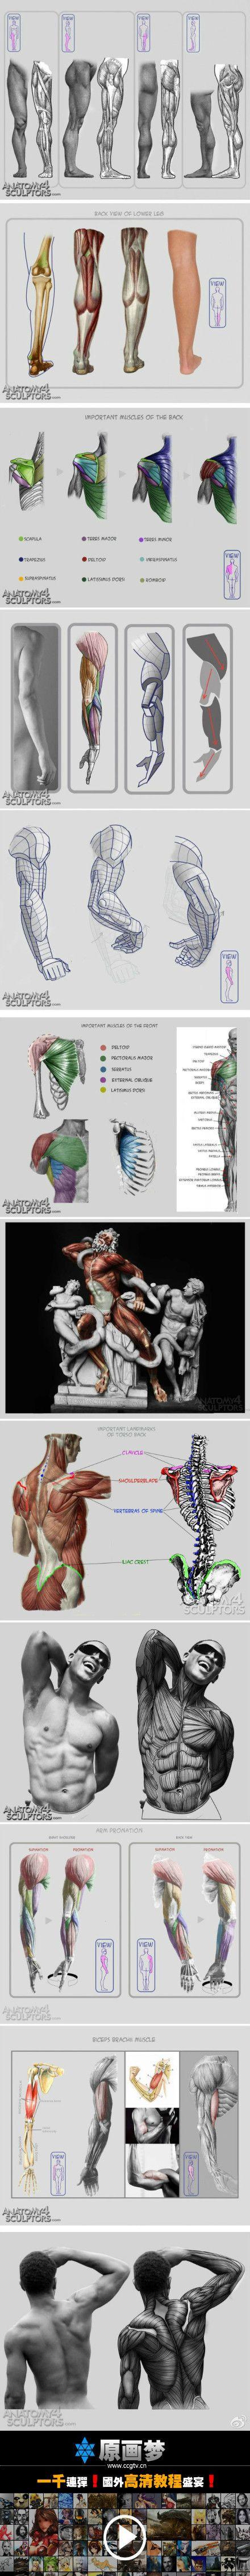 1060 best anatomia images on Pinterest | Anatomy reference, Anatomy ...